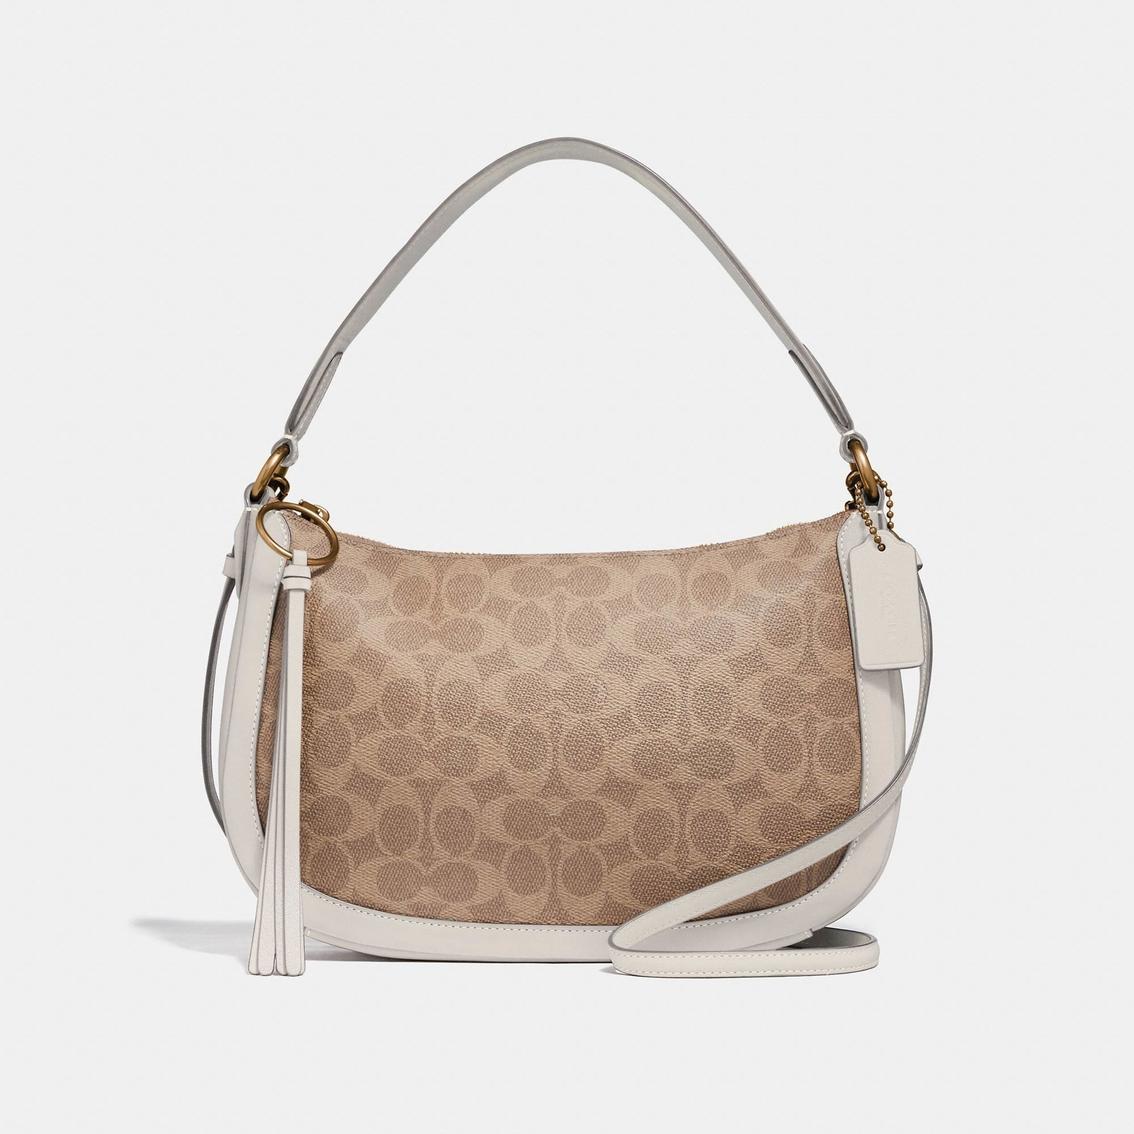 5246b1151559 Coach Sutton Signature Coated Canvas Crossbody Handbag